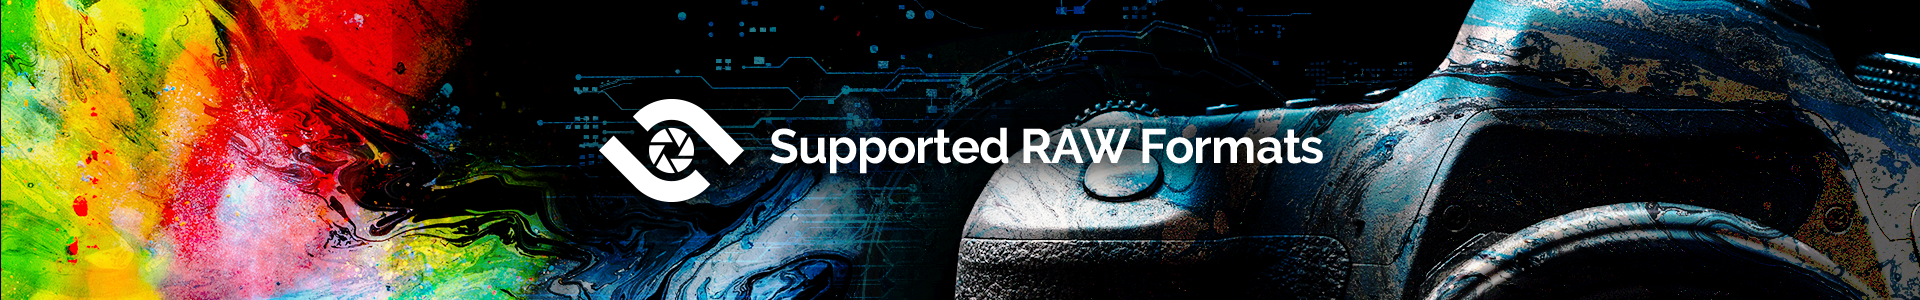 Raw Formats banner